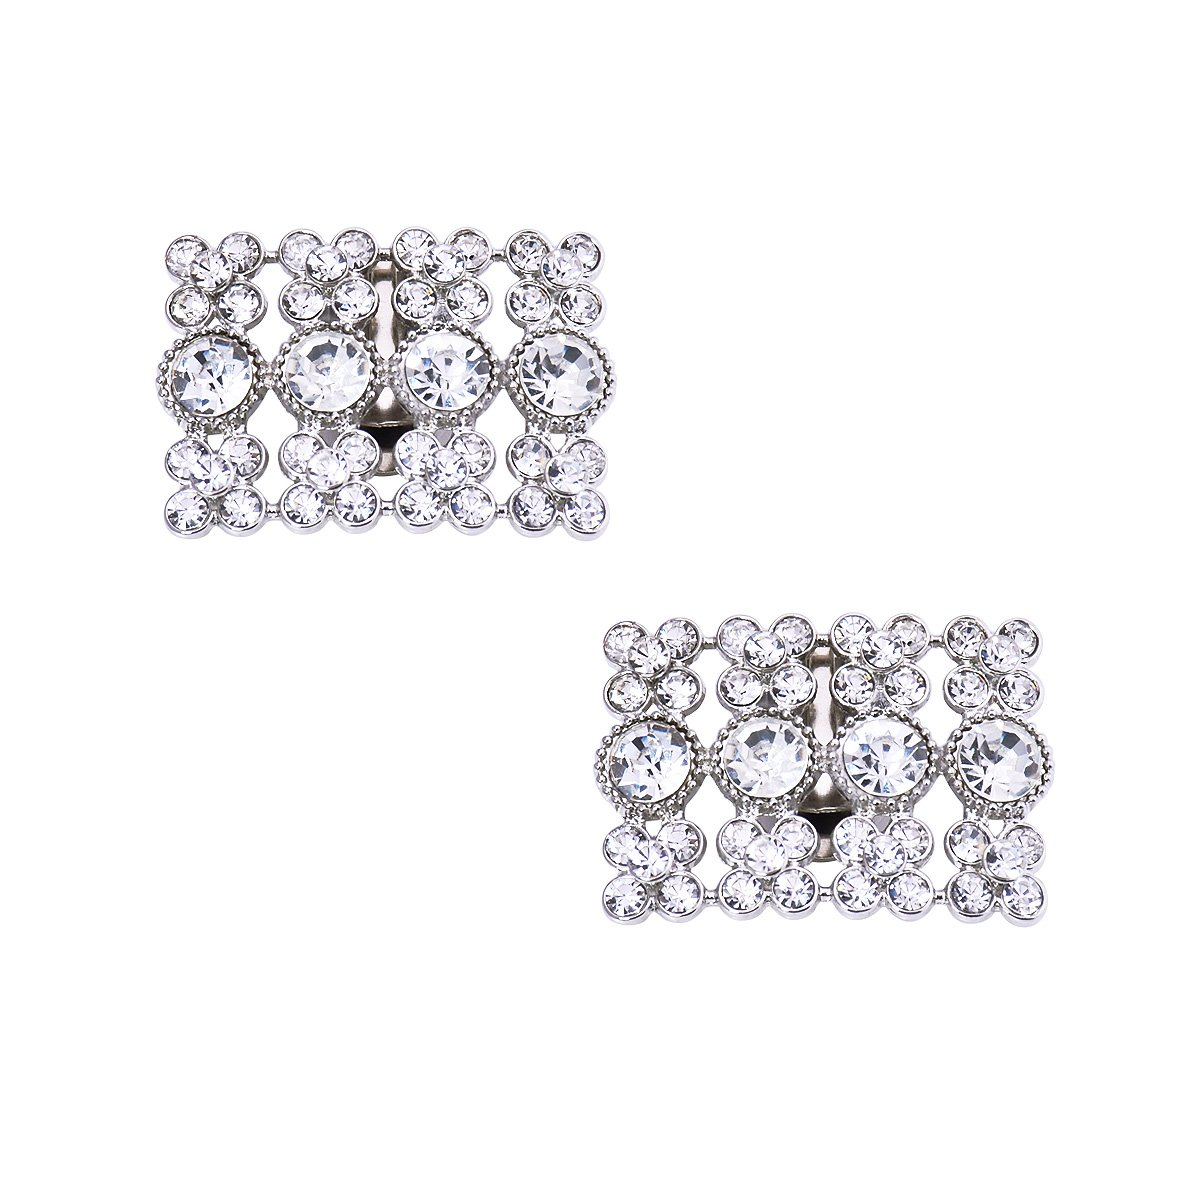 ElegantPark AX 2 Pcs Shoe Clips Rhinestones Wedding Party Decoration Silver